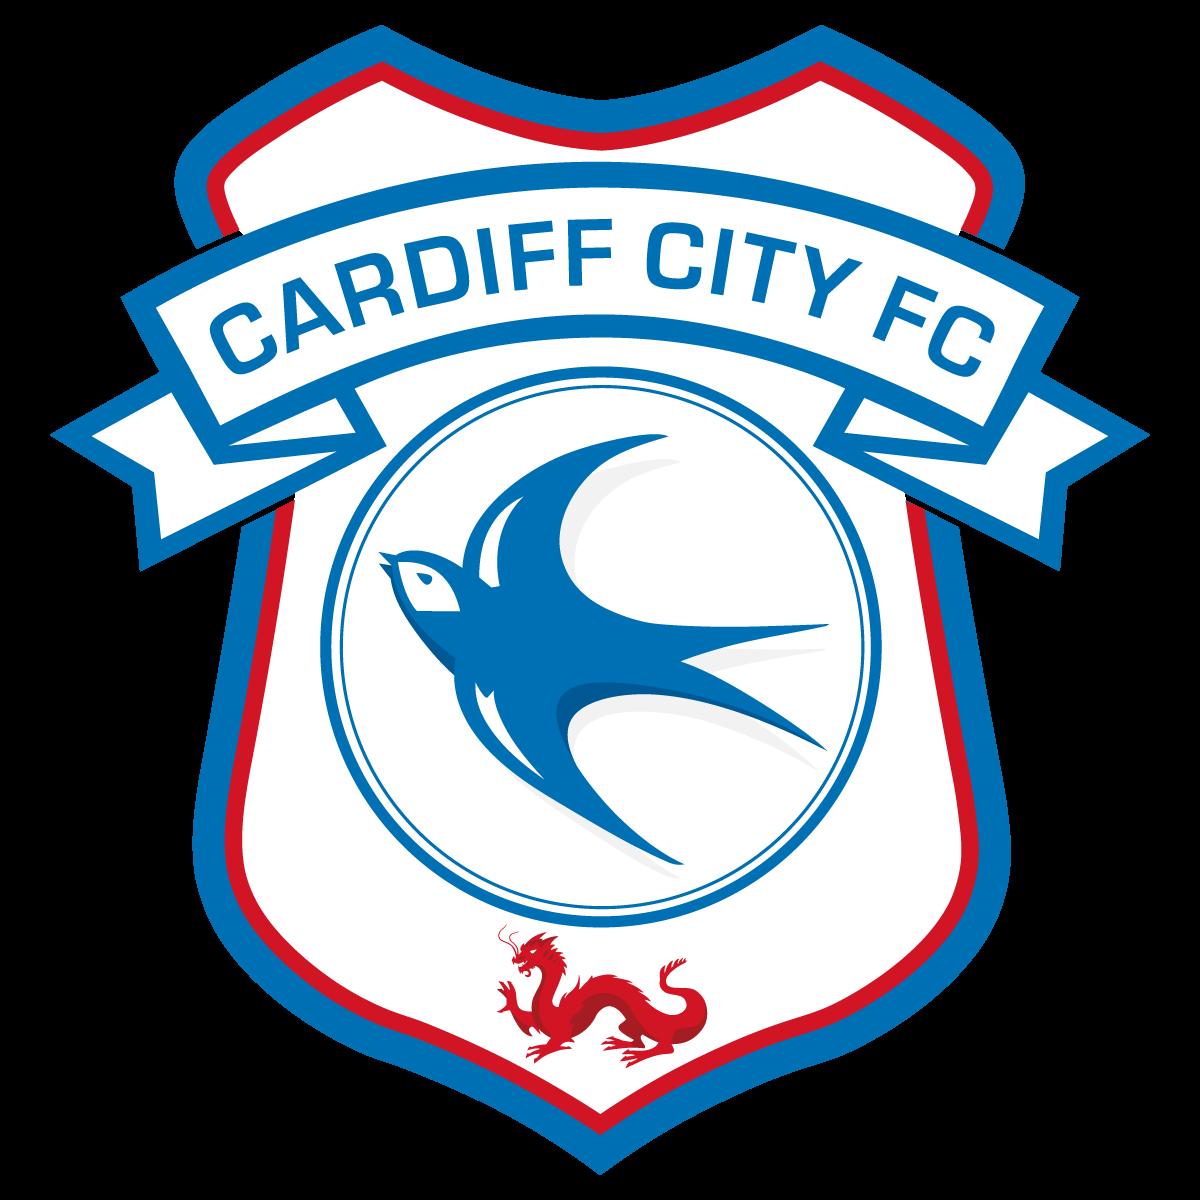 1200x1200 Cardiff City Fc Football Club Crest Logo Vector Free Vector